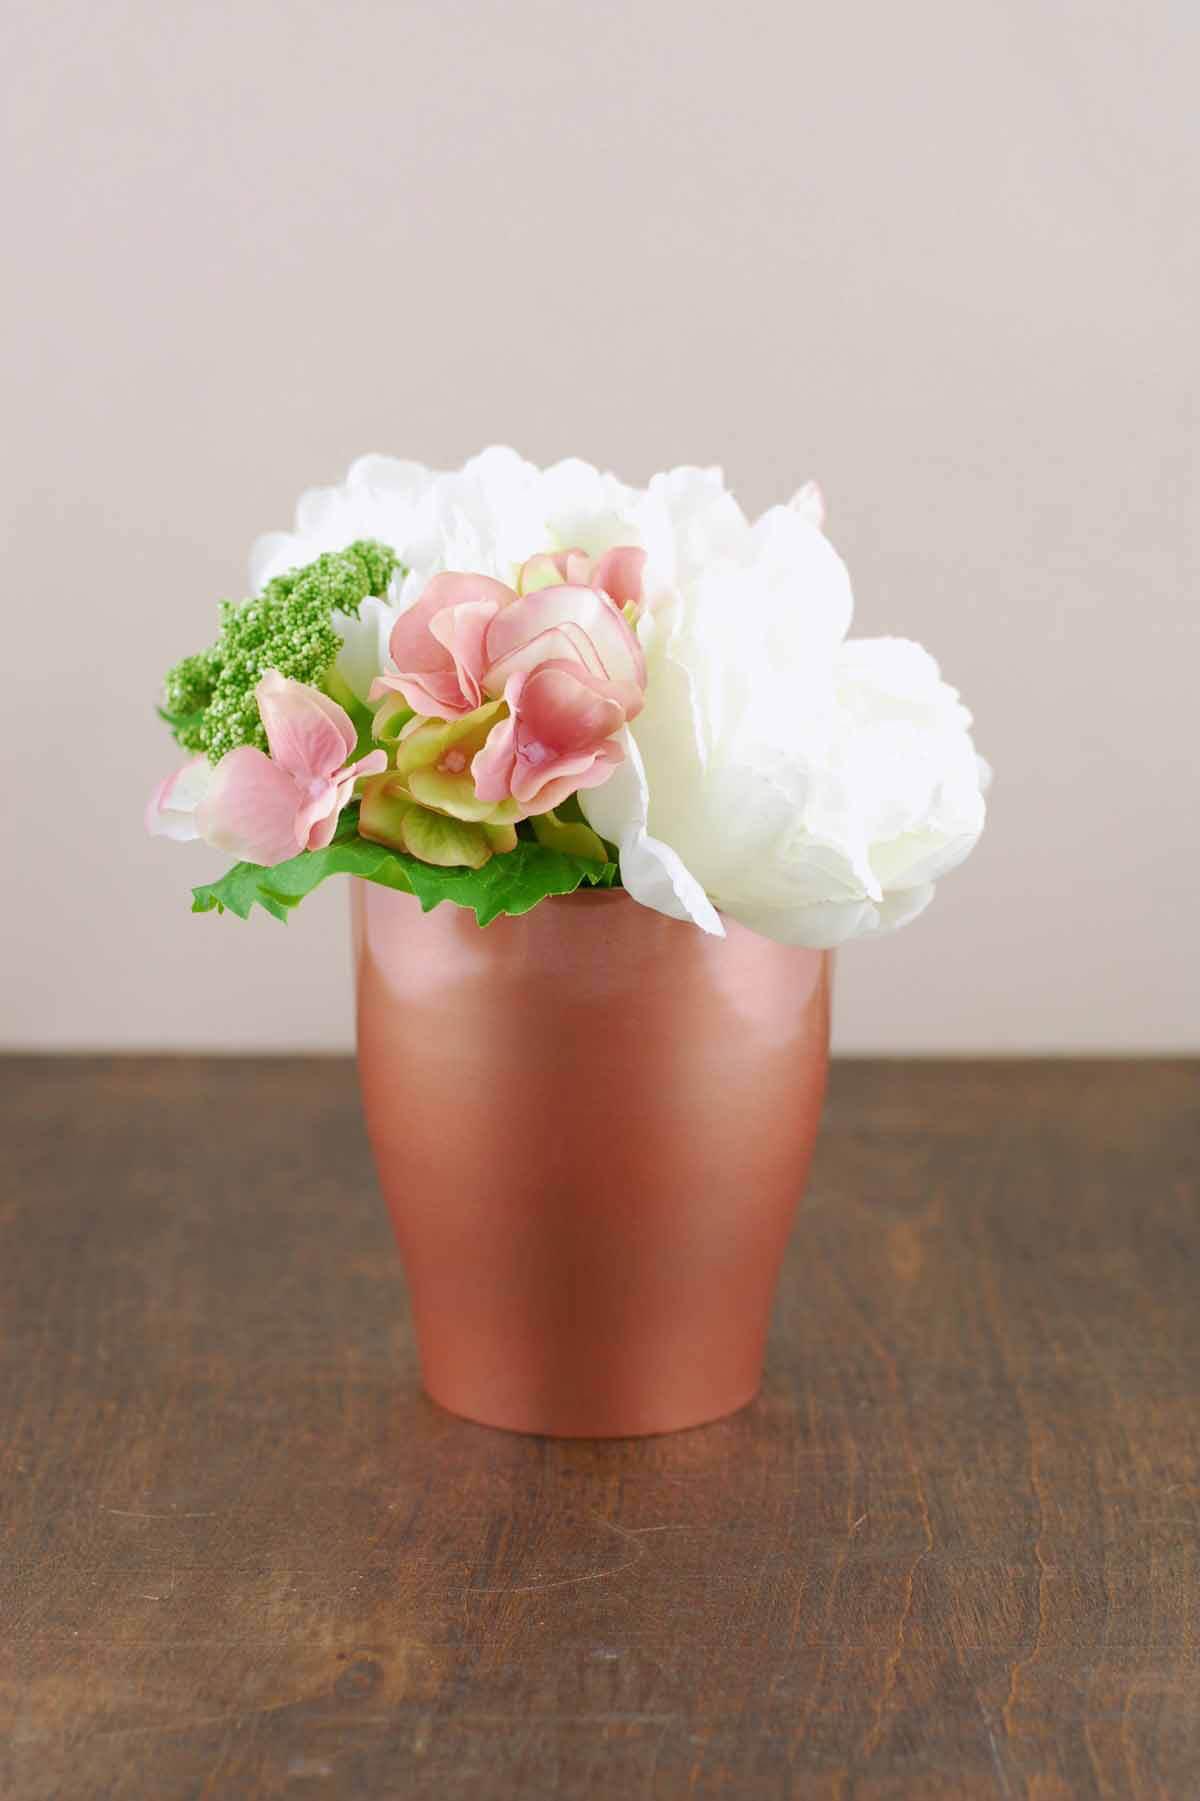 Rose Gold Metal Pot Vase 4.75in